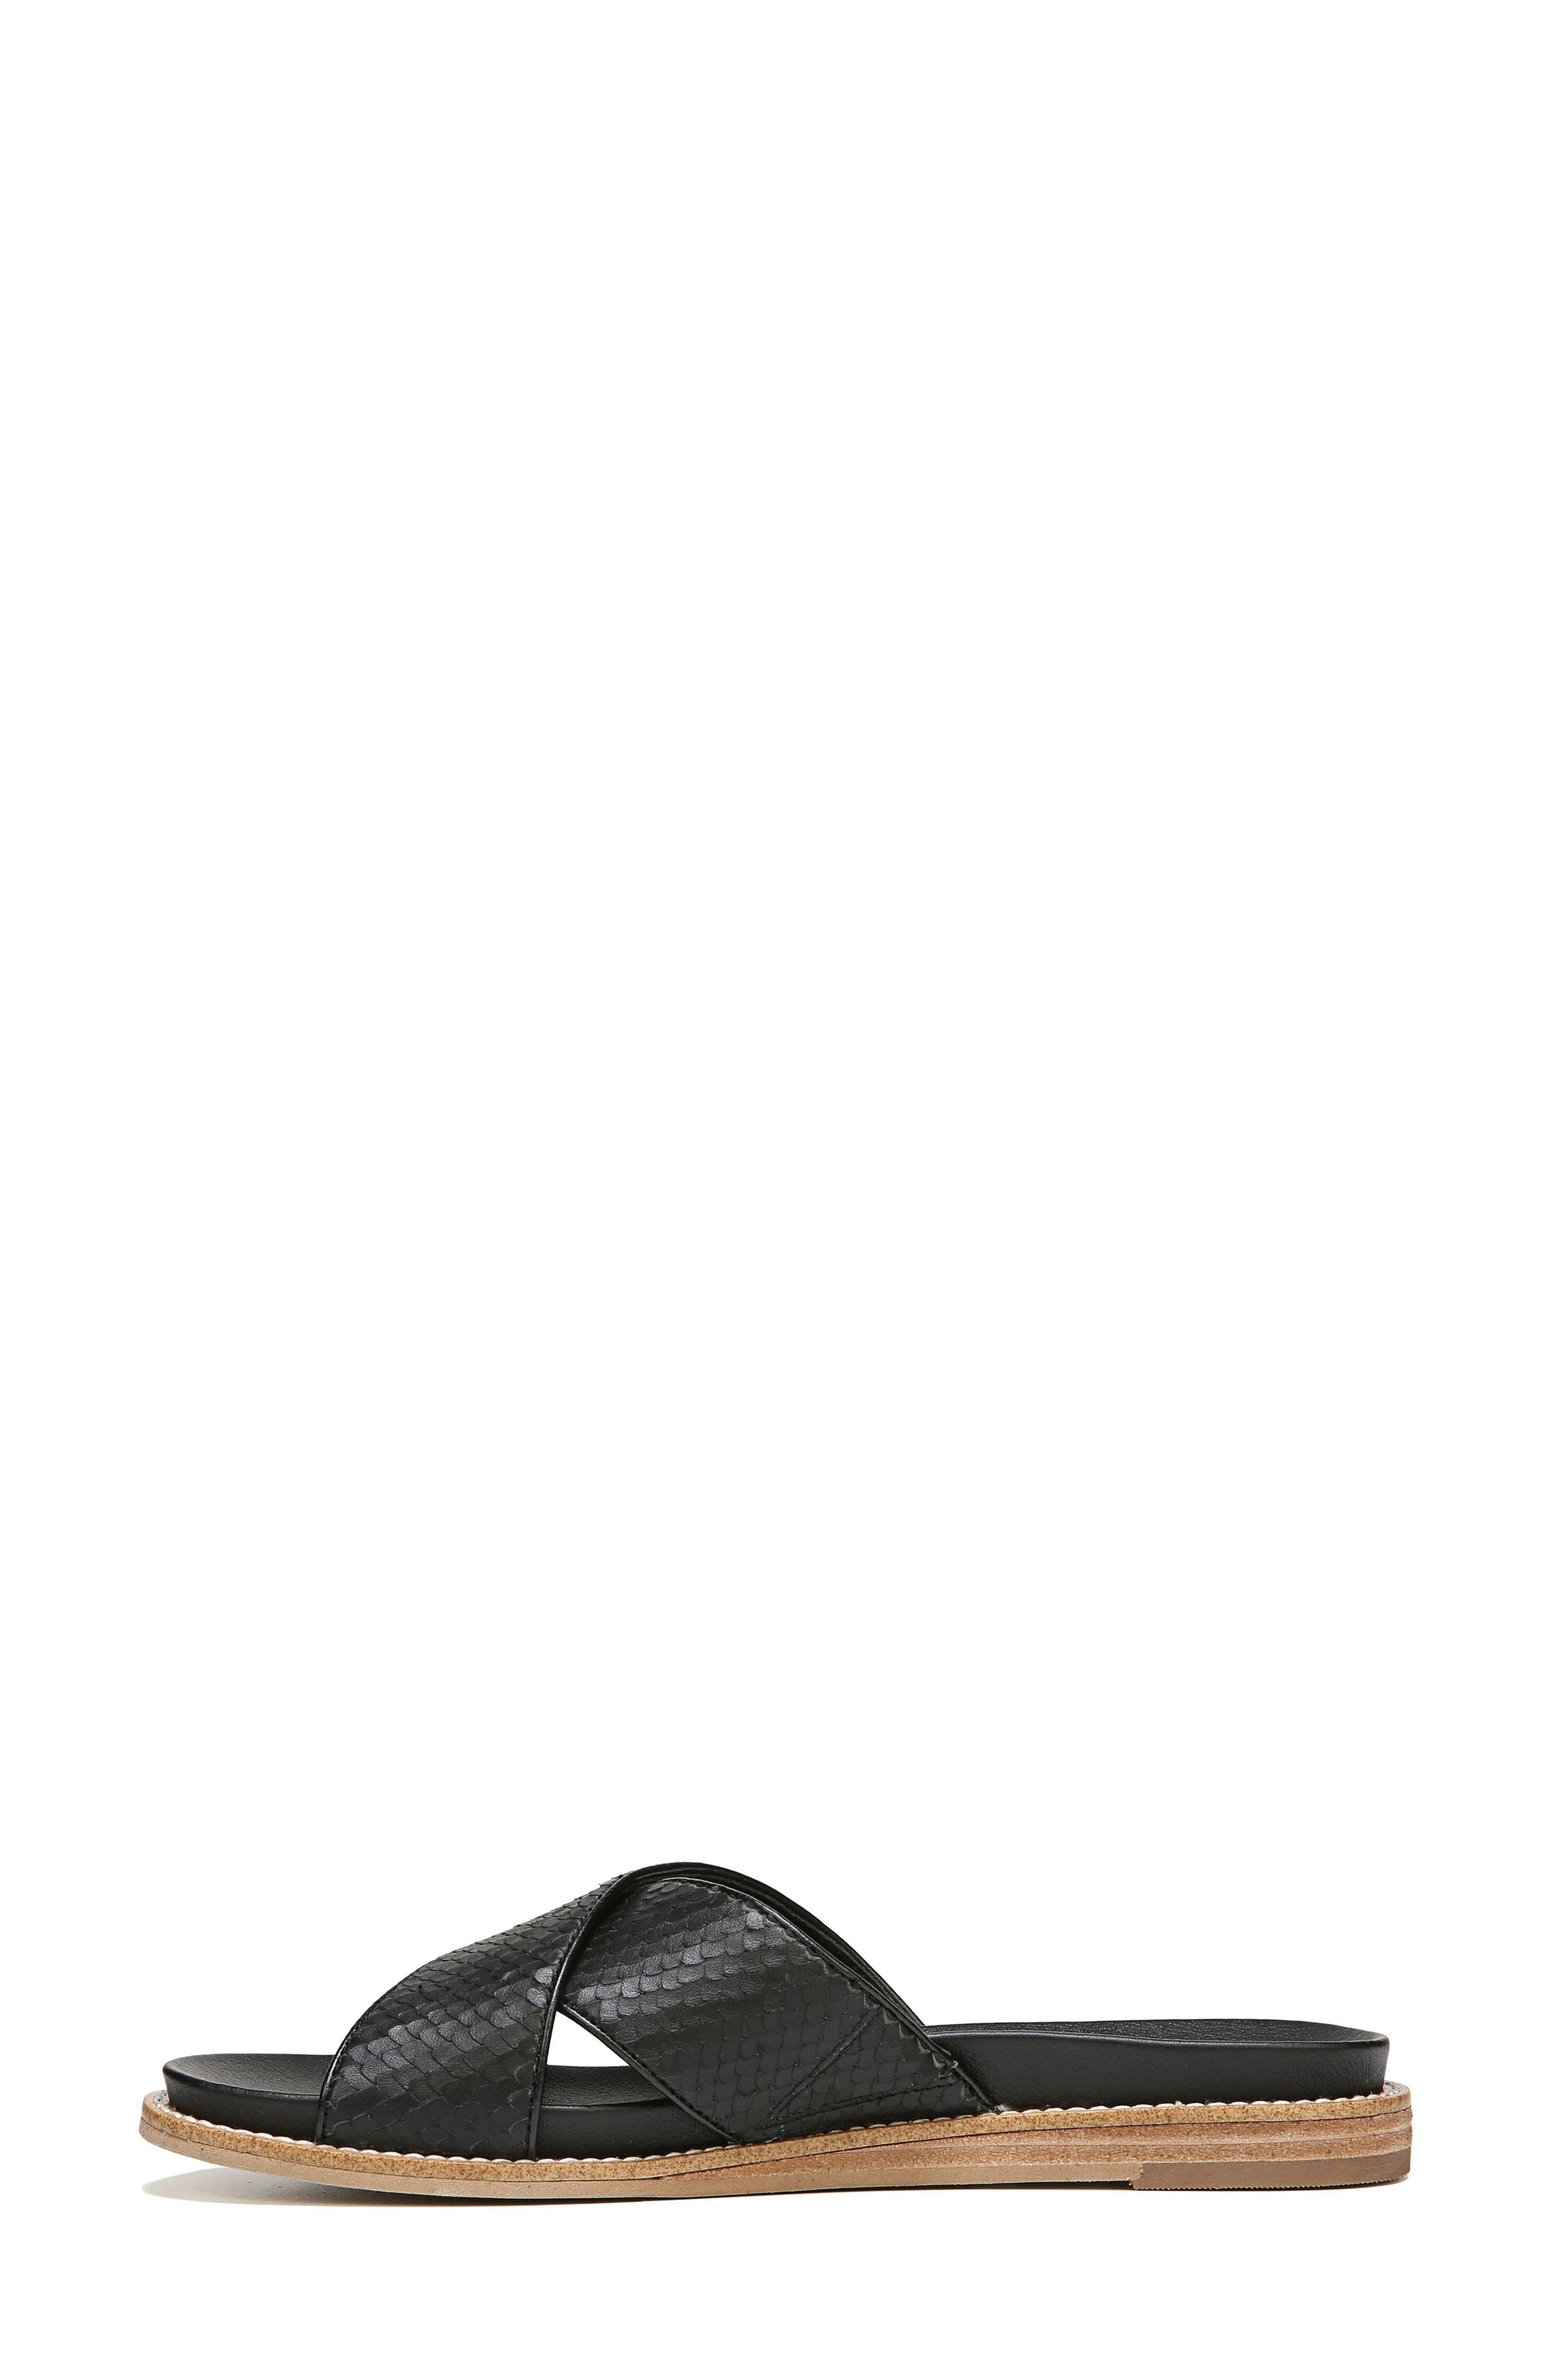 DR. SCHOLL'S, Deco Slide Sandal, Alternate thumbnail 3, color, BLACK LEATHER